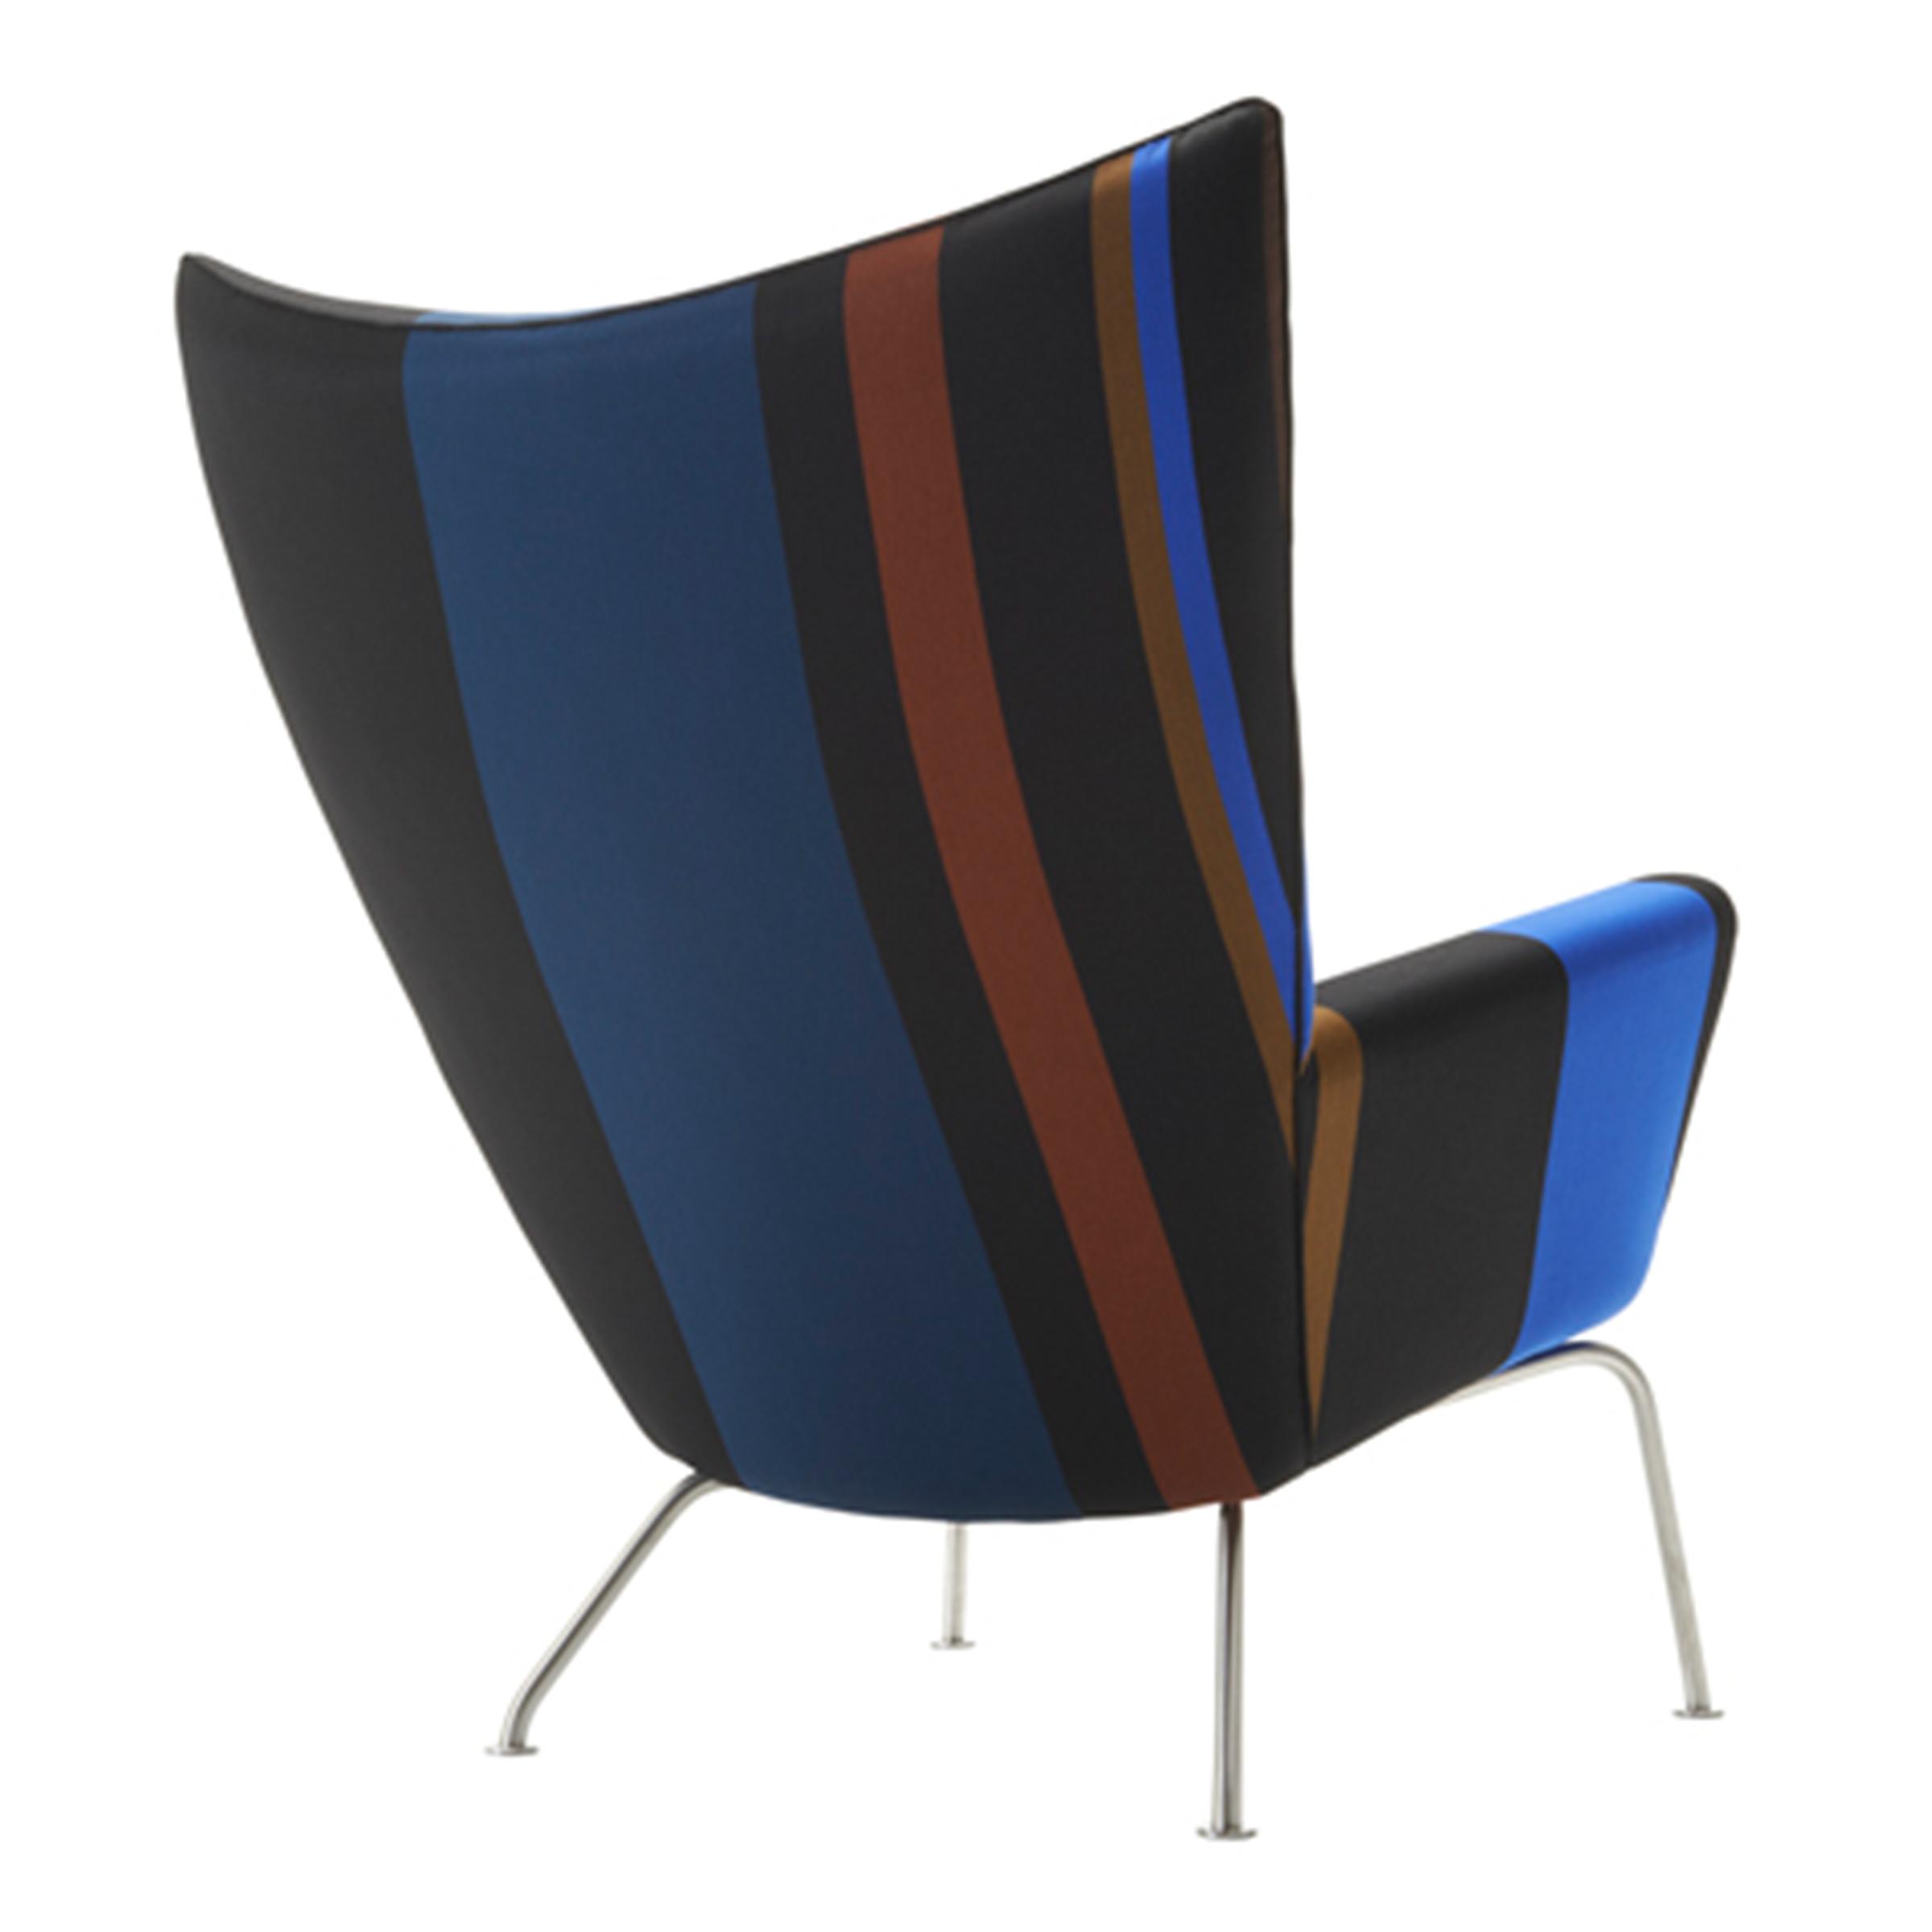 Danish Home Design Ideas: Ch445 Wing Chair. Hans J. Wegner, Paul Smith